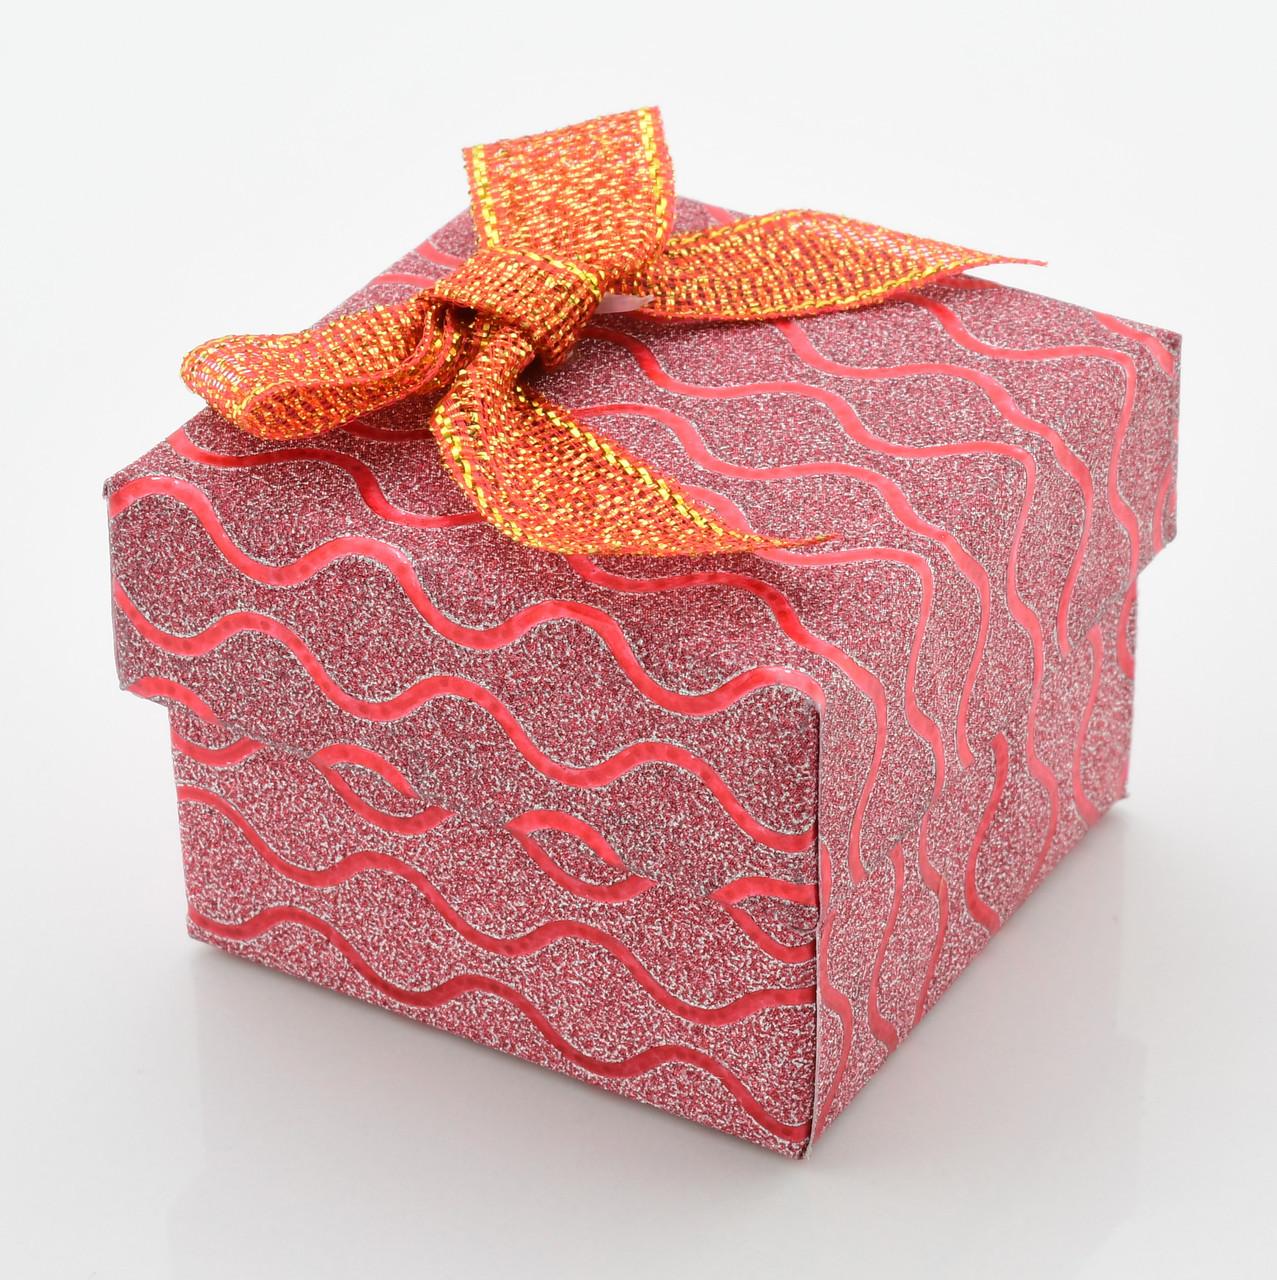 Коробочка для кольца-серег 741208 красная, размер 4*5 см